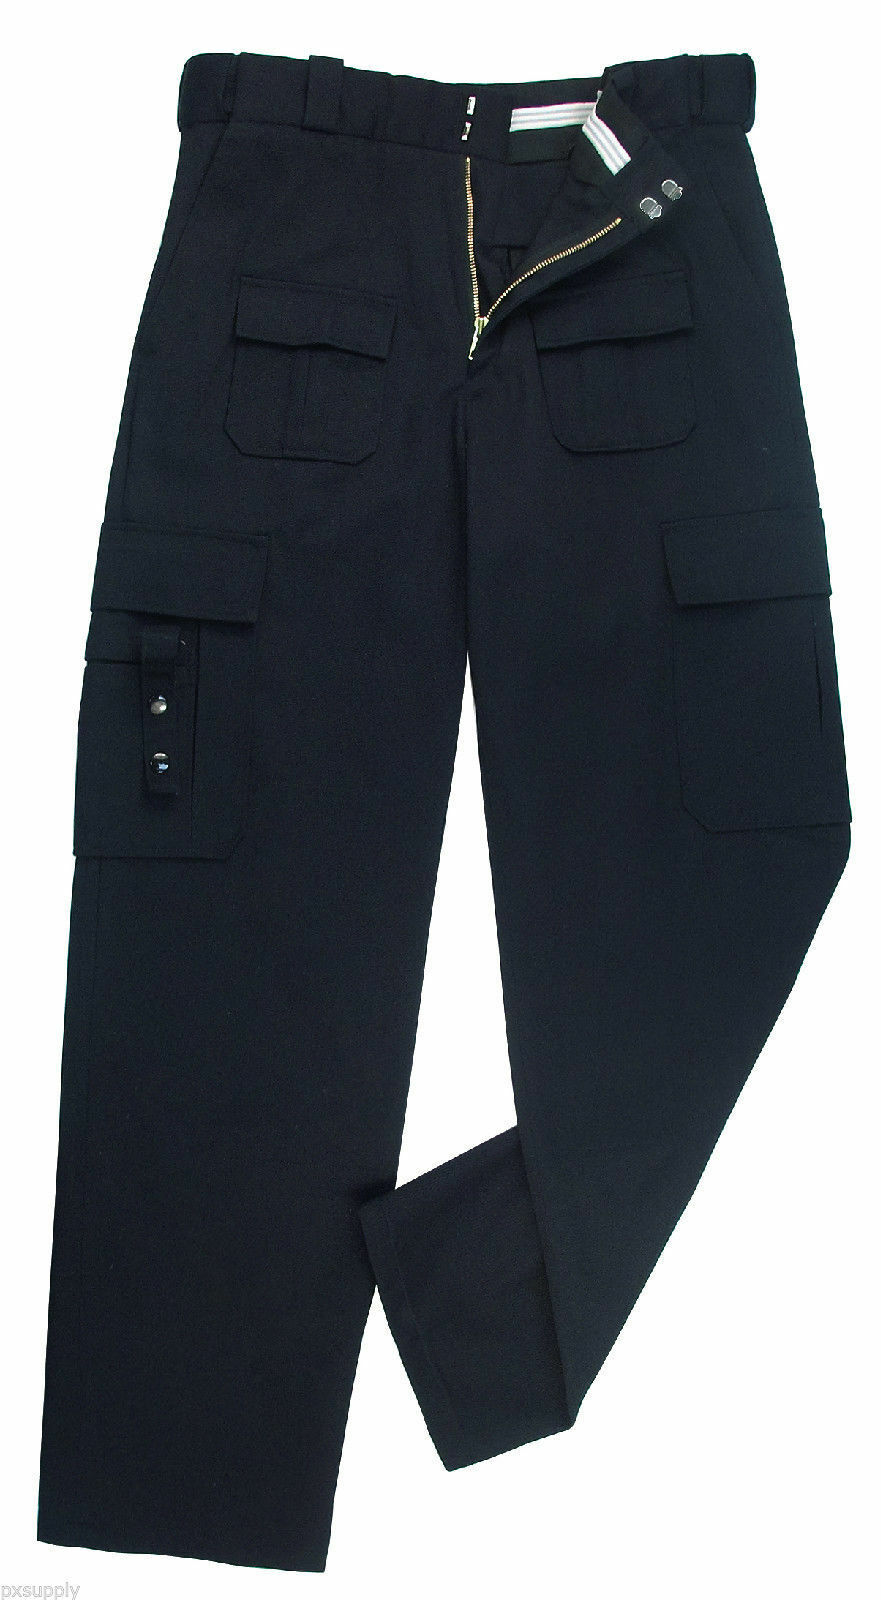 Midnite bluee Police Style Ultra Tec Tactical BDU Uniform Pants 9861 redhco